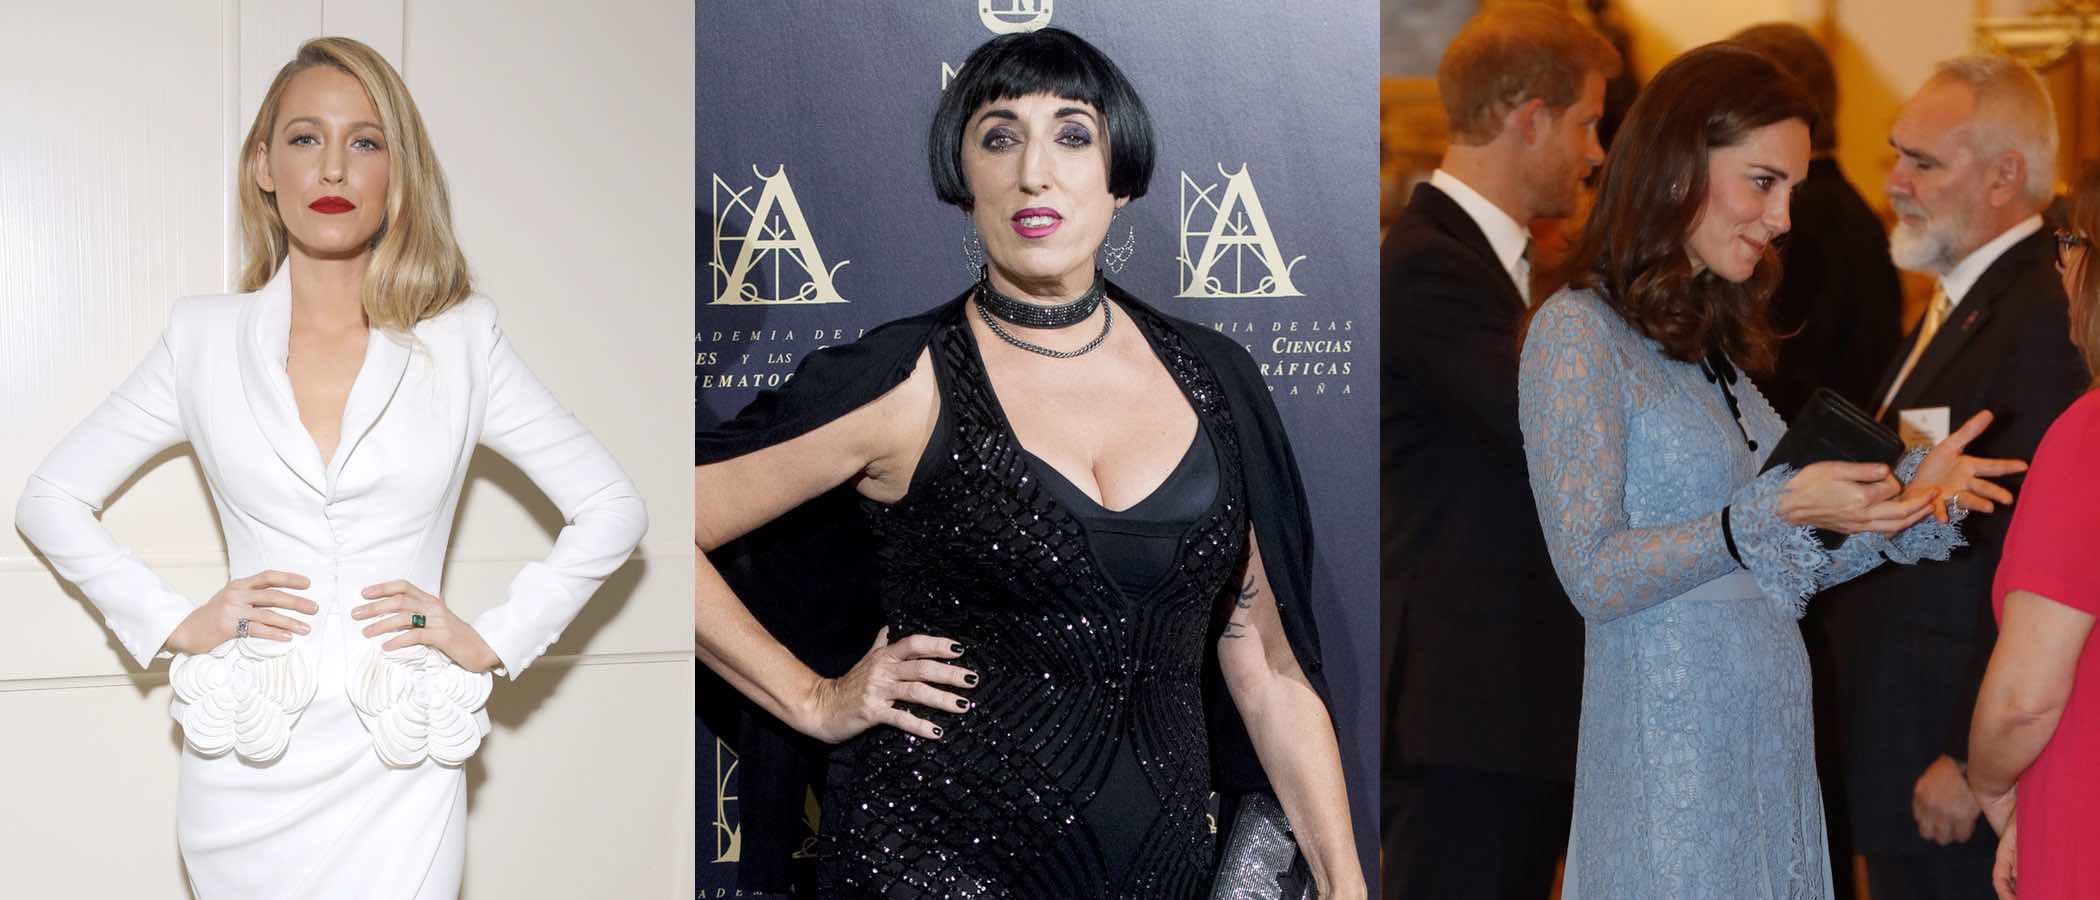 Blake Lively, Rossy de Palma y Kate Middleton, entre las mejor vestidas de la semana